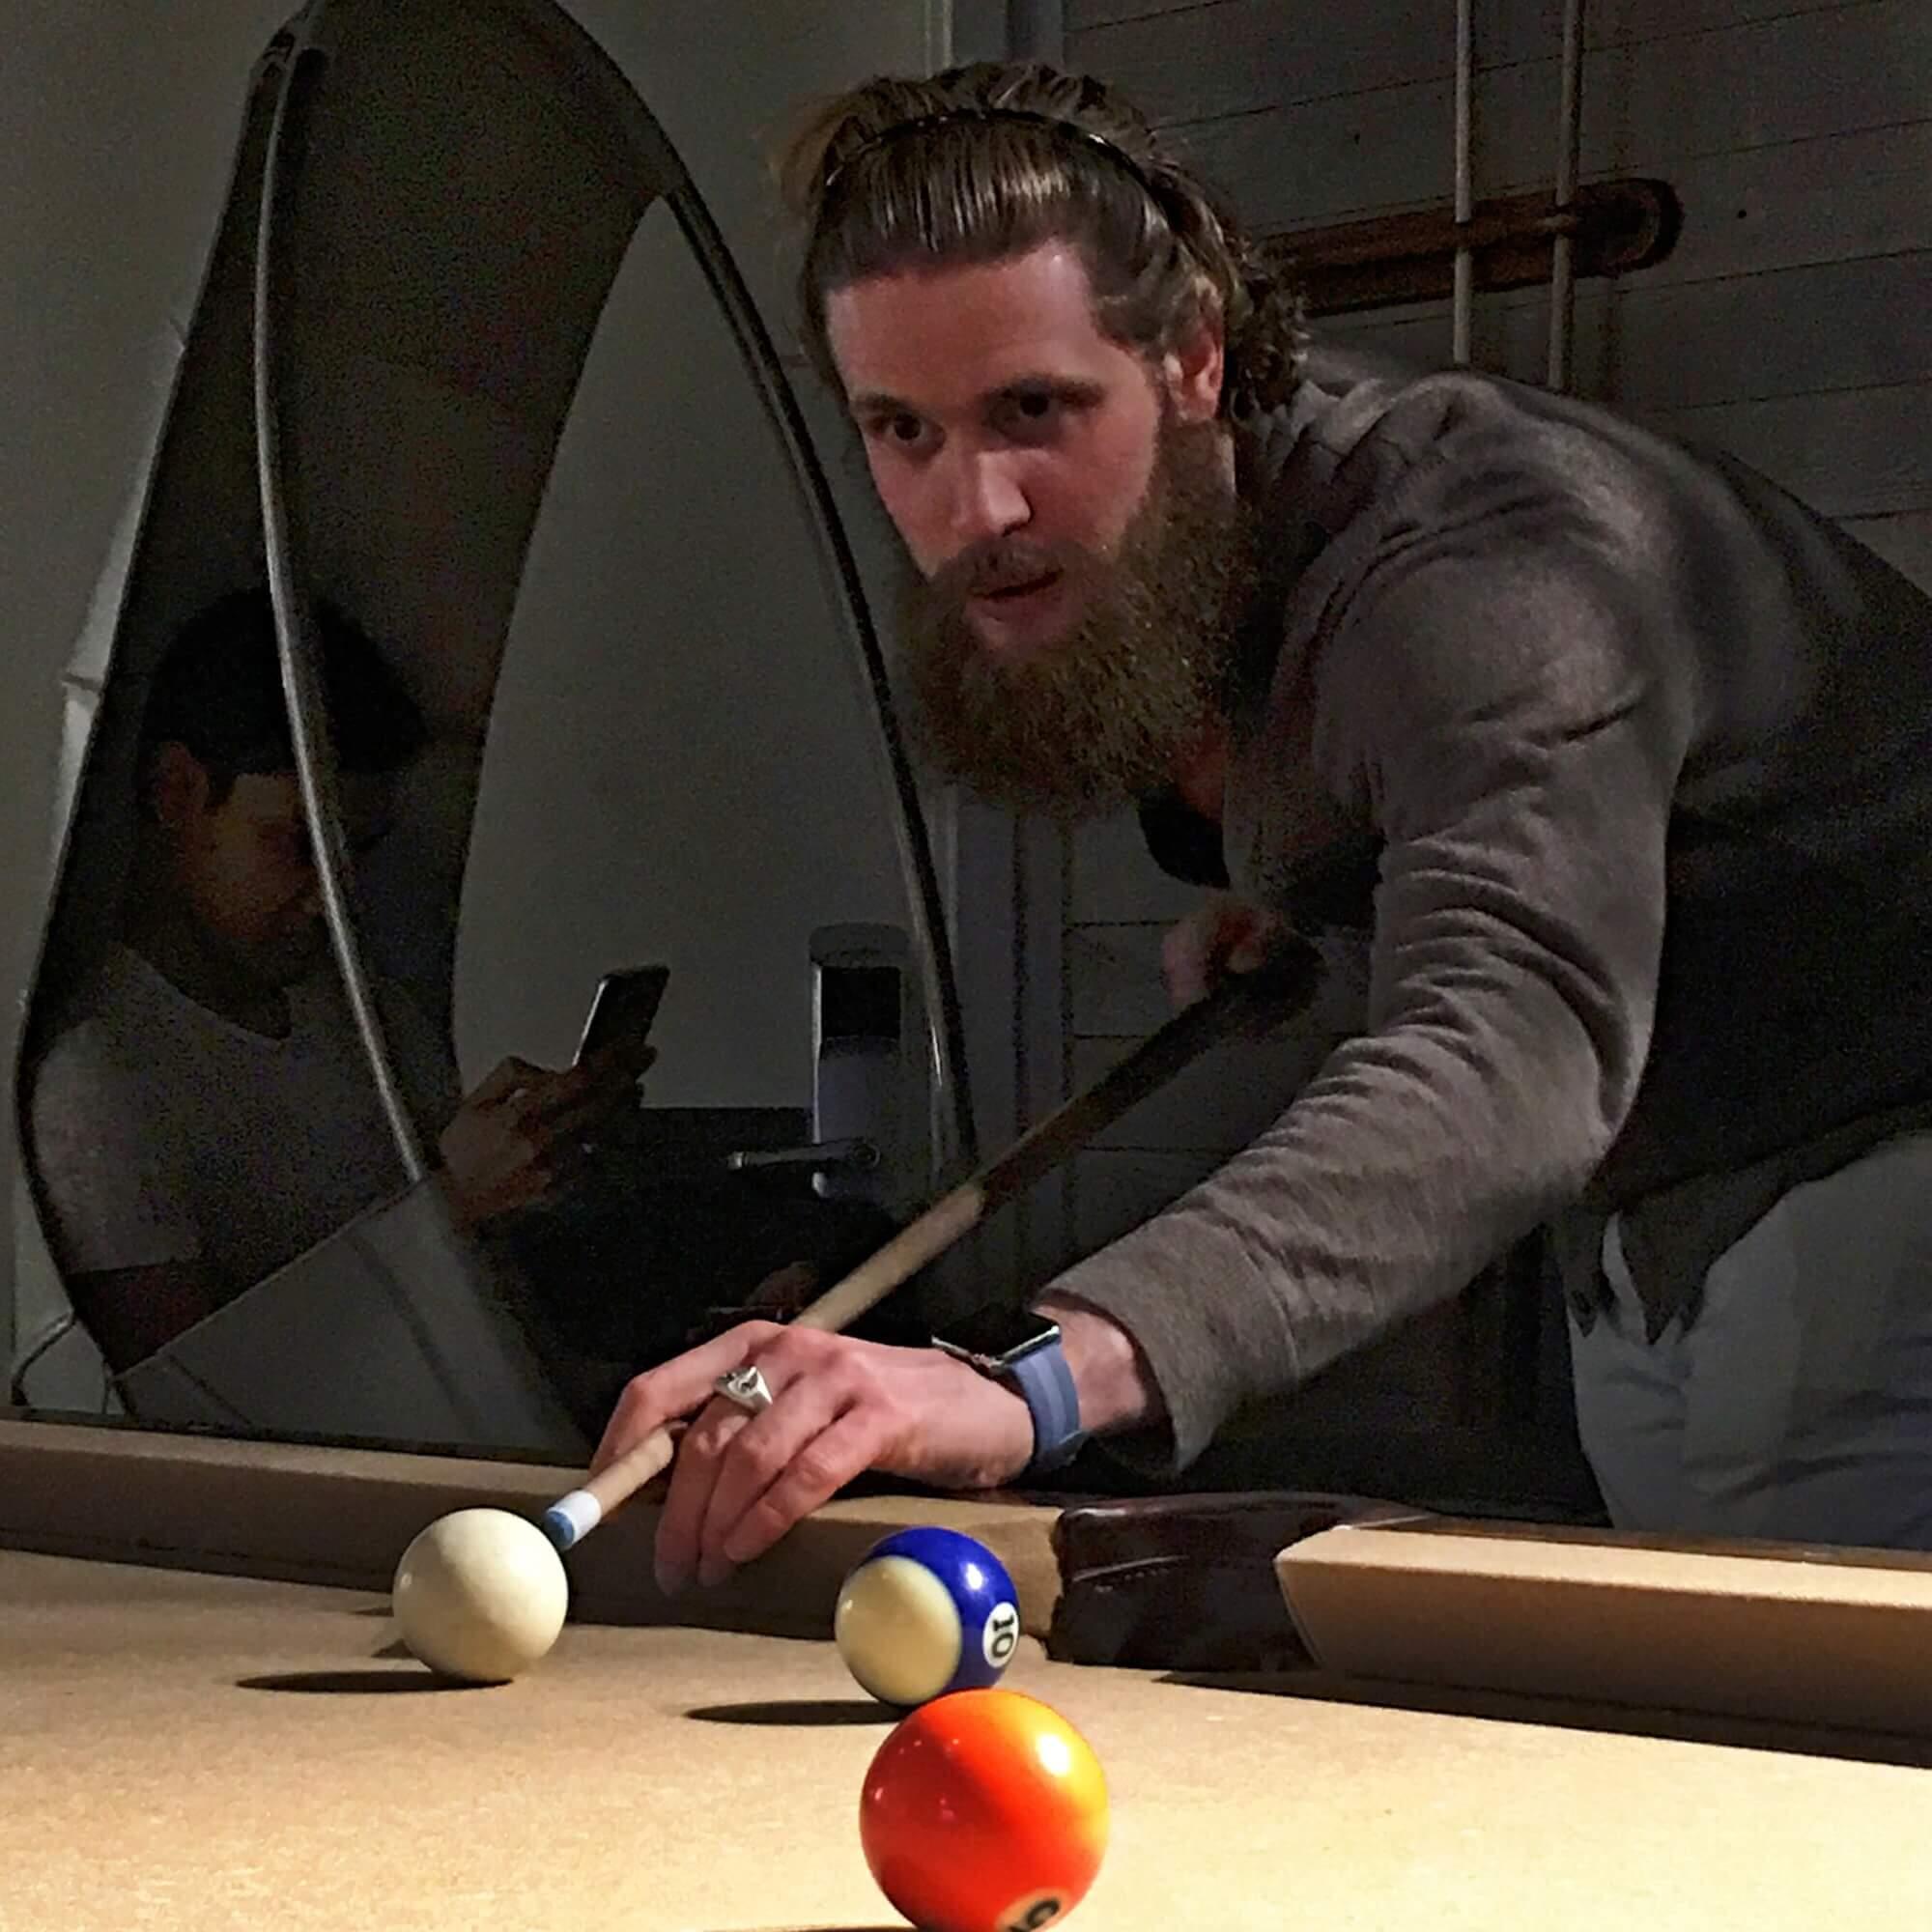 Aaron Krause Playing Pool